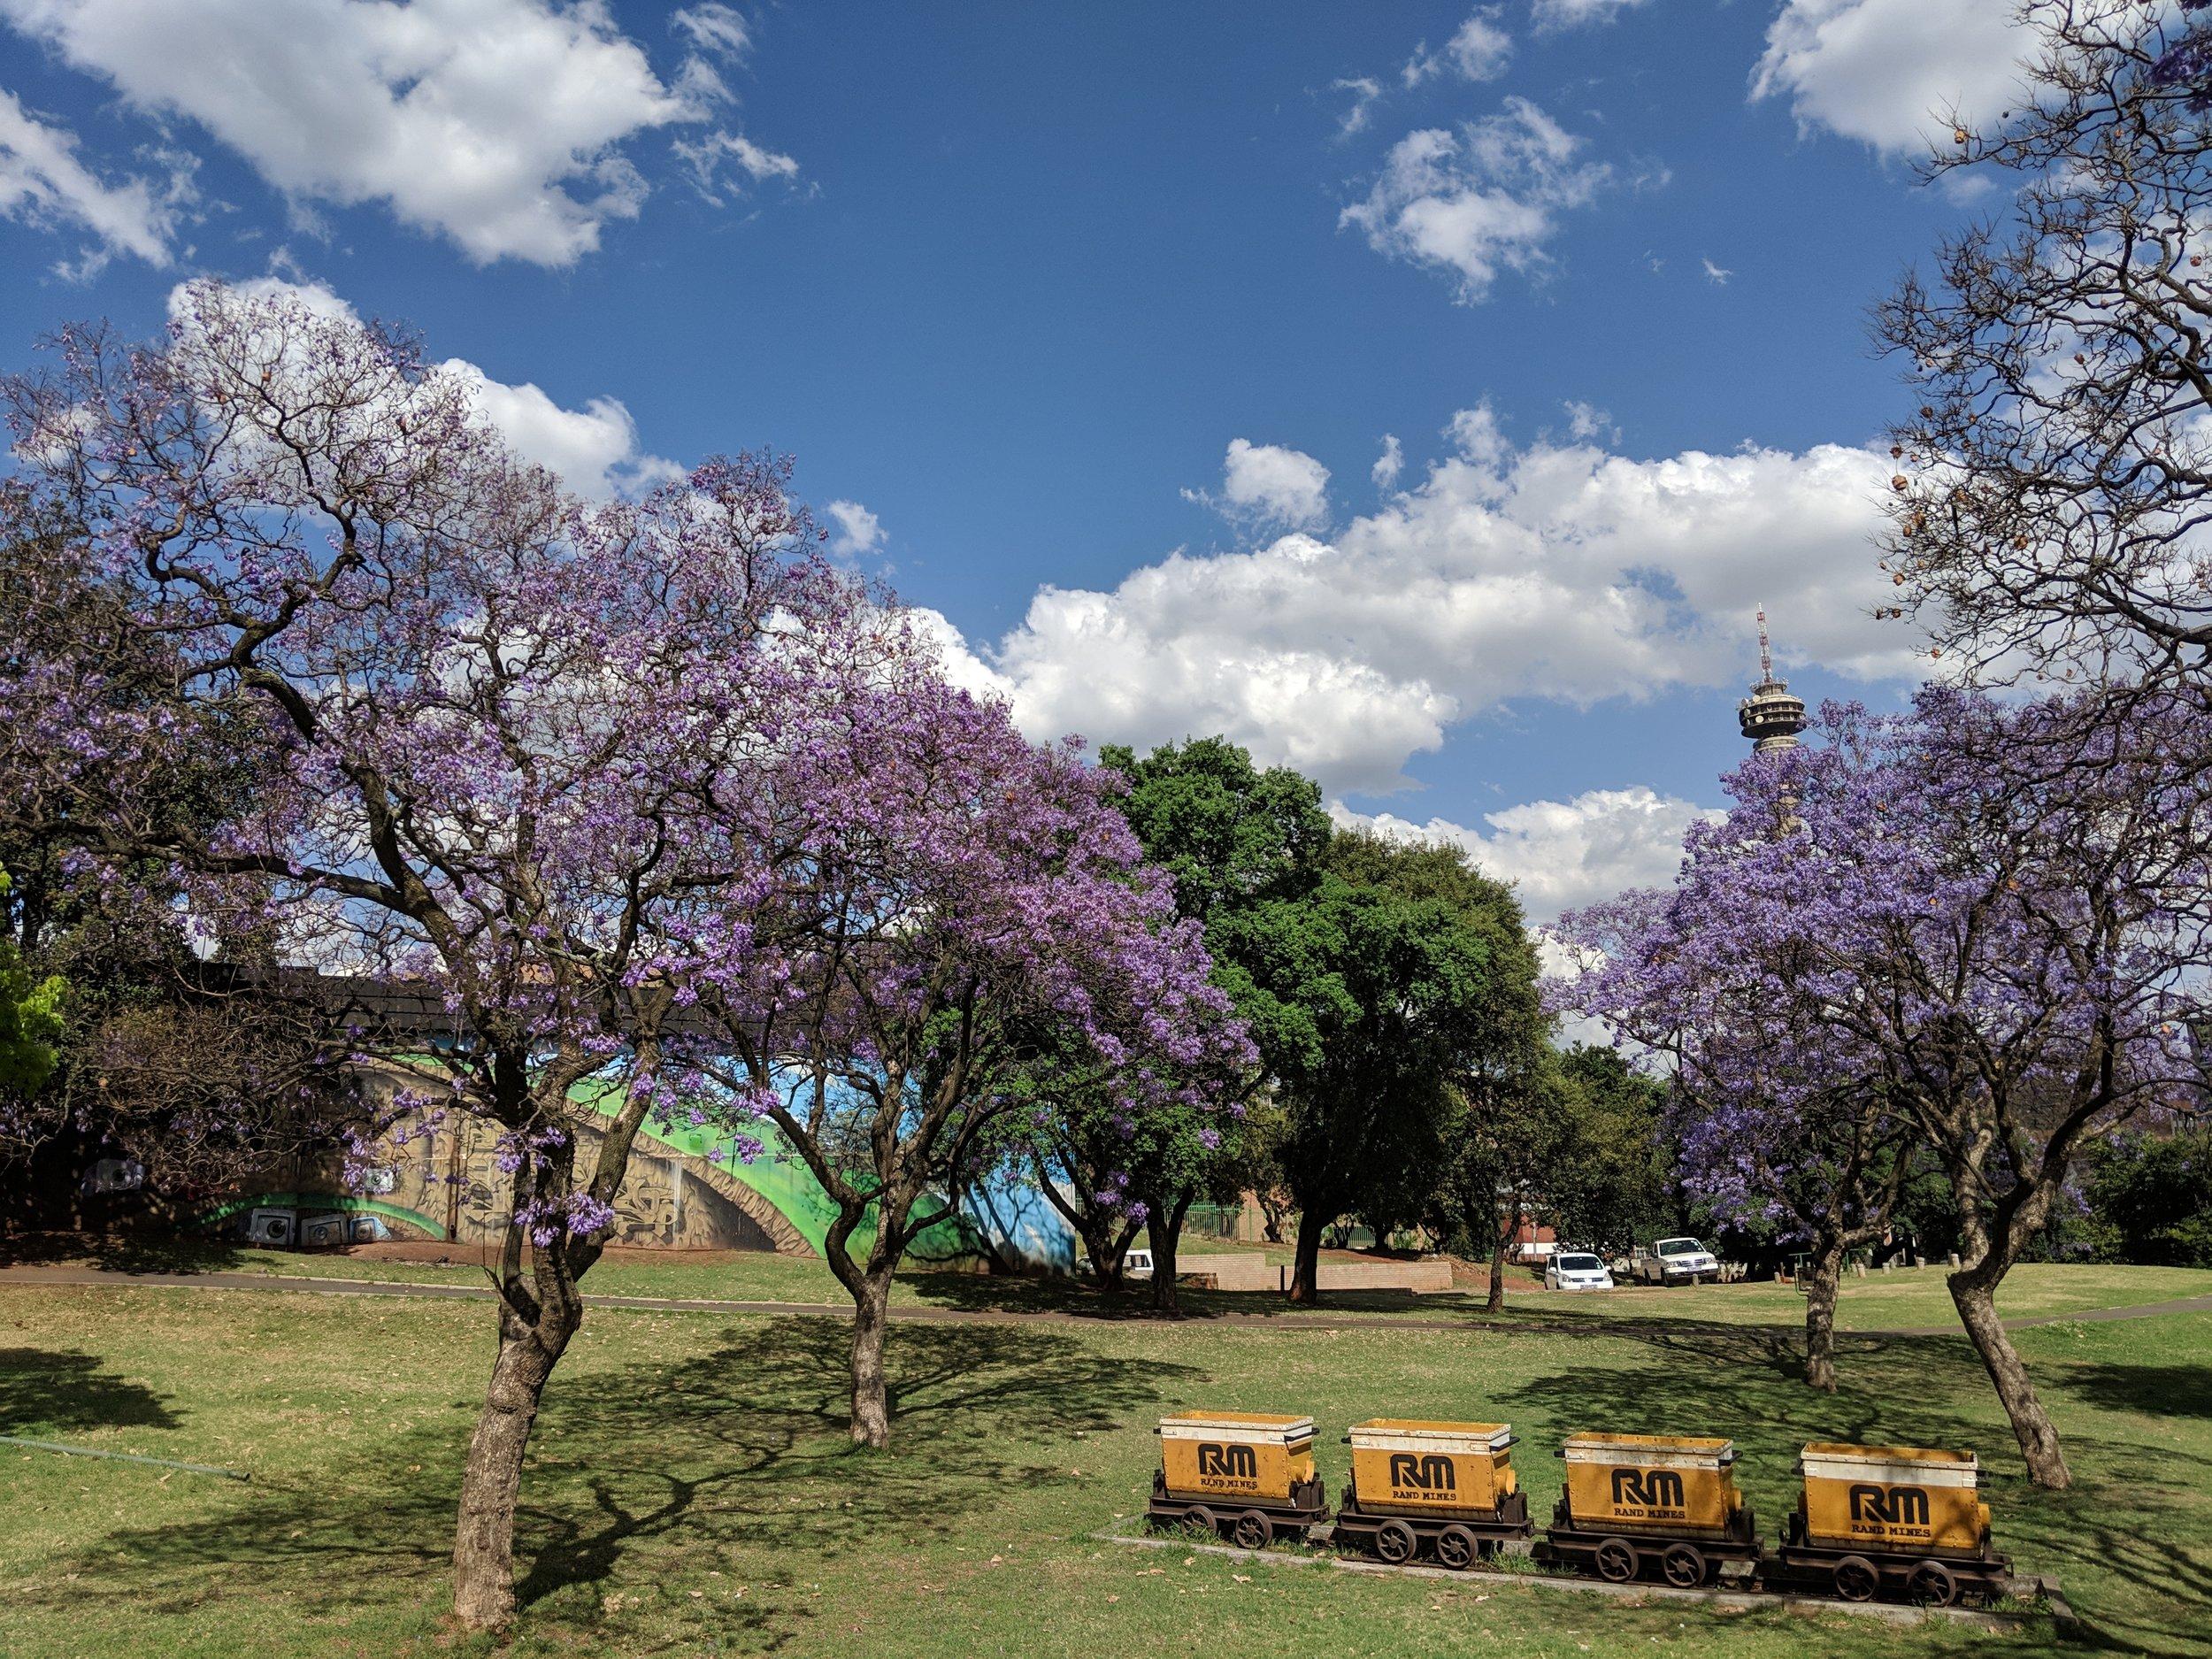 Jacaranda trees in full bloom in Johannesburg. Johannesburg Itinerary